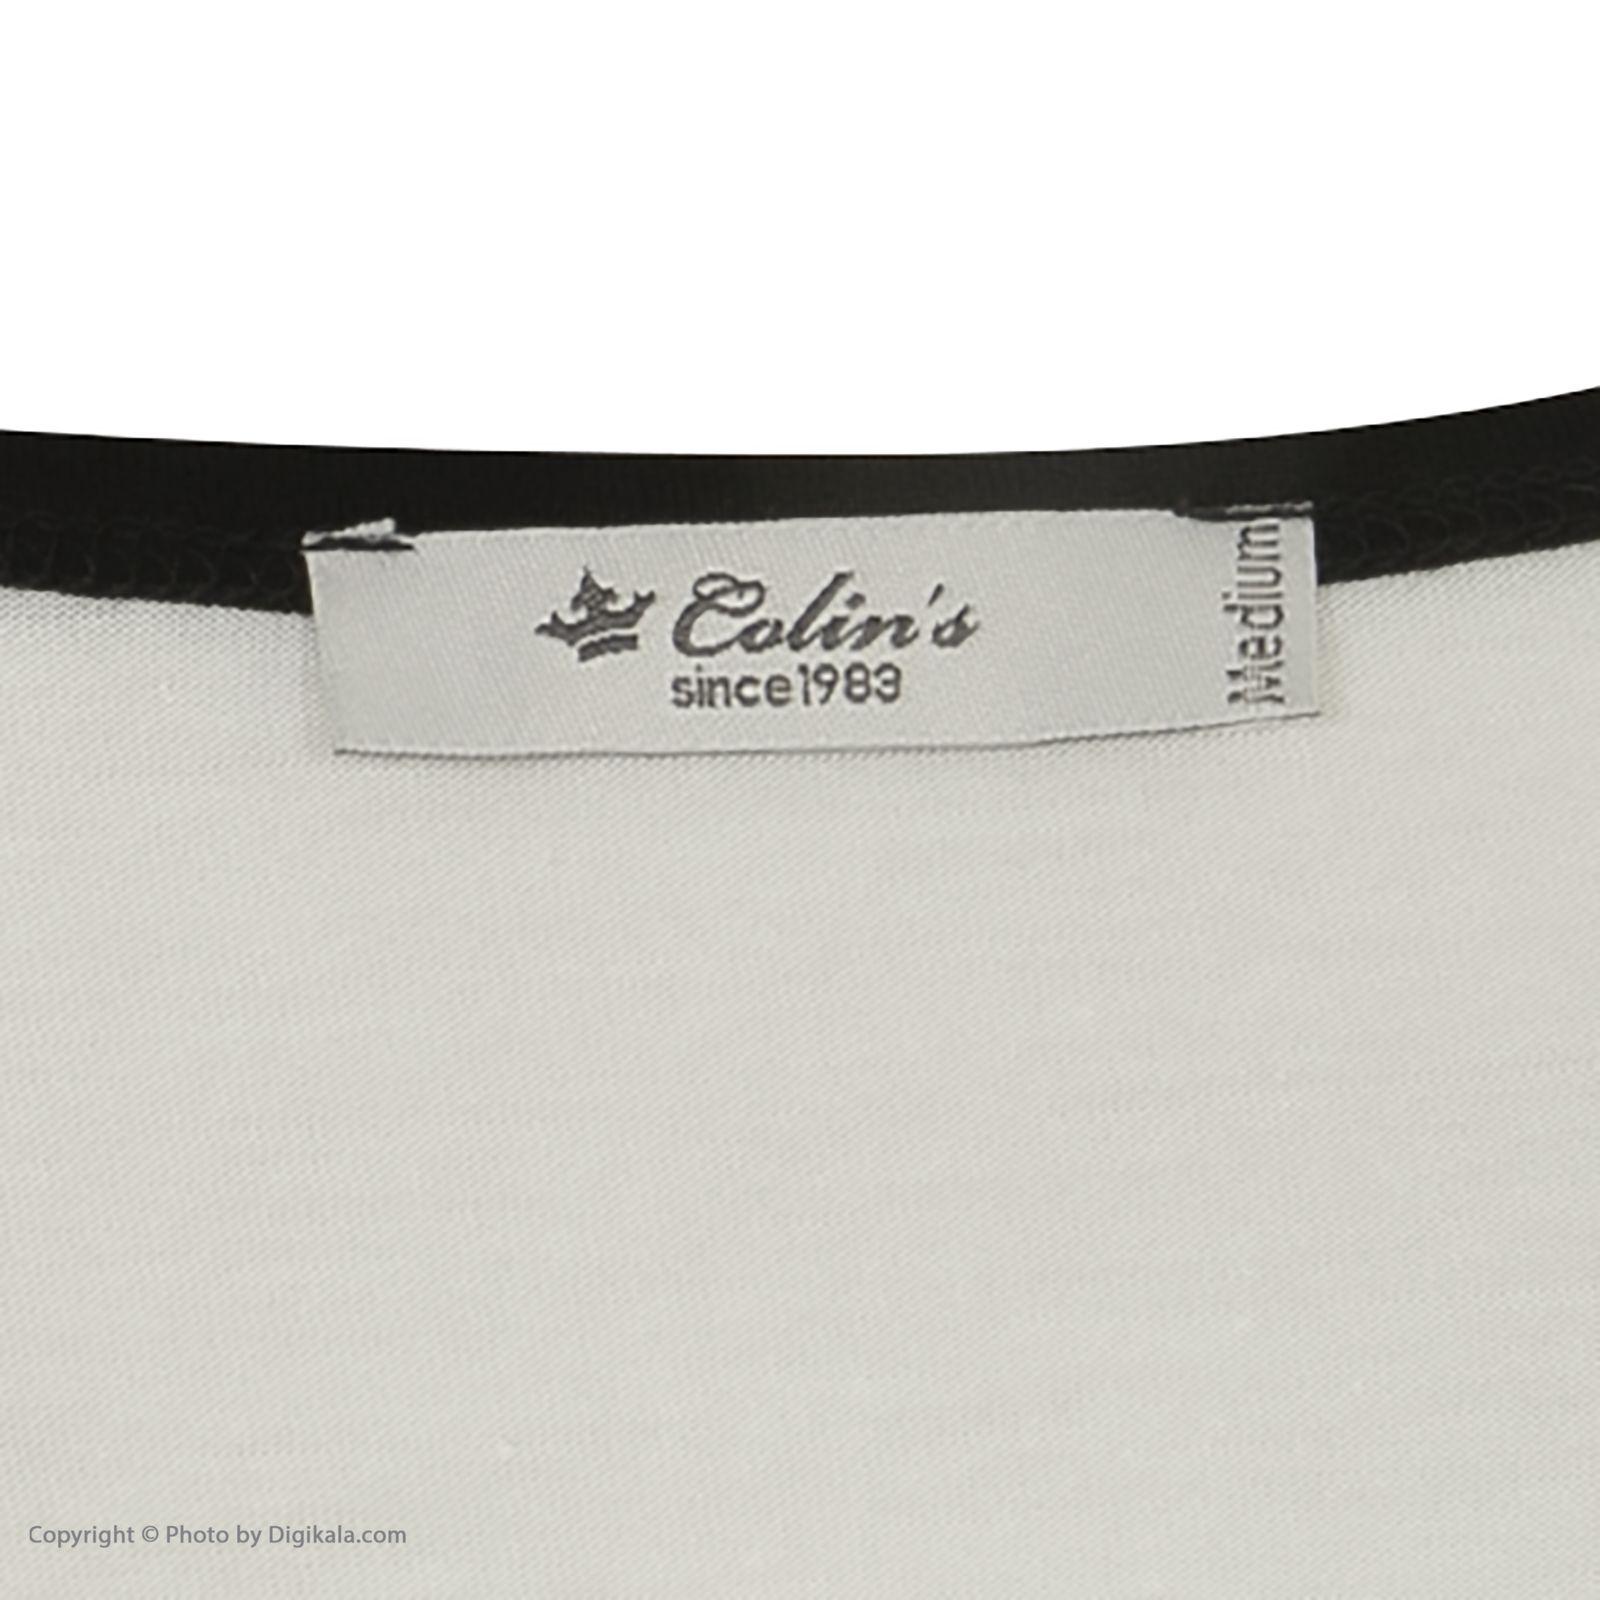 تی شرت زنانه کالینز مدل CL1032902-OFF WHITE main 1 5